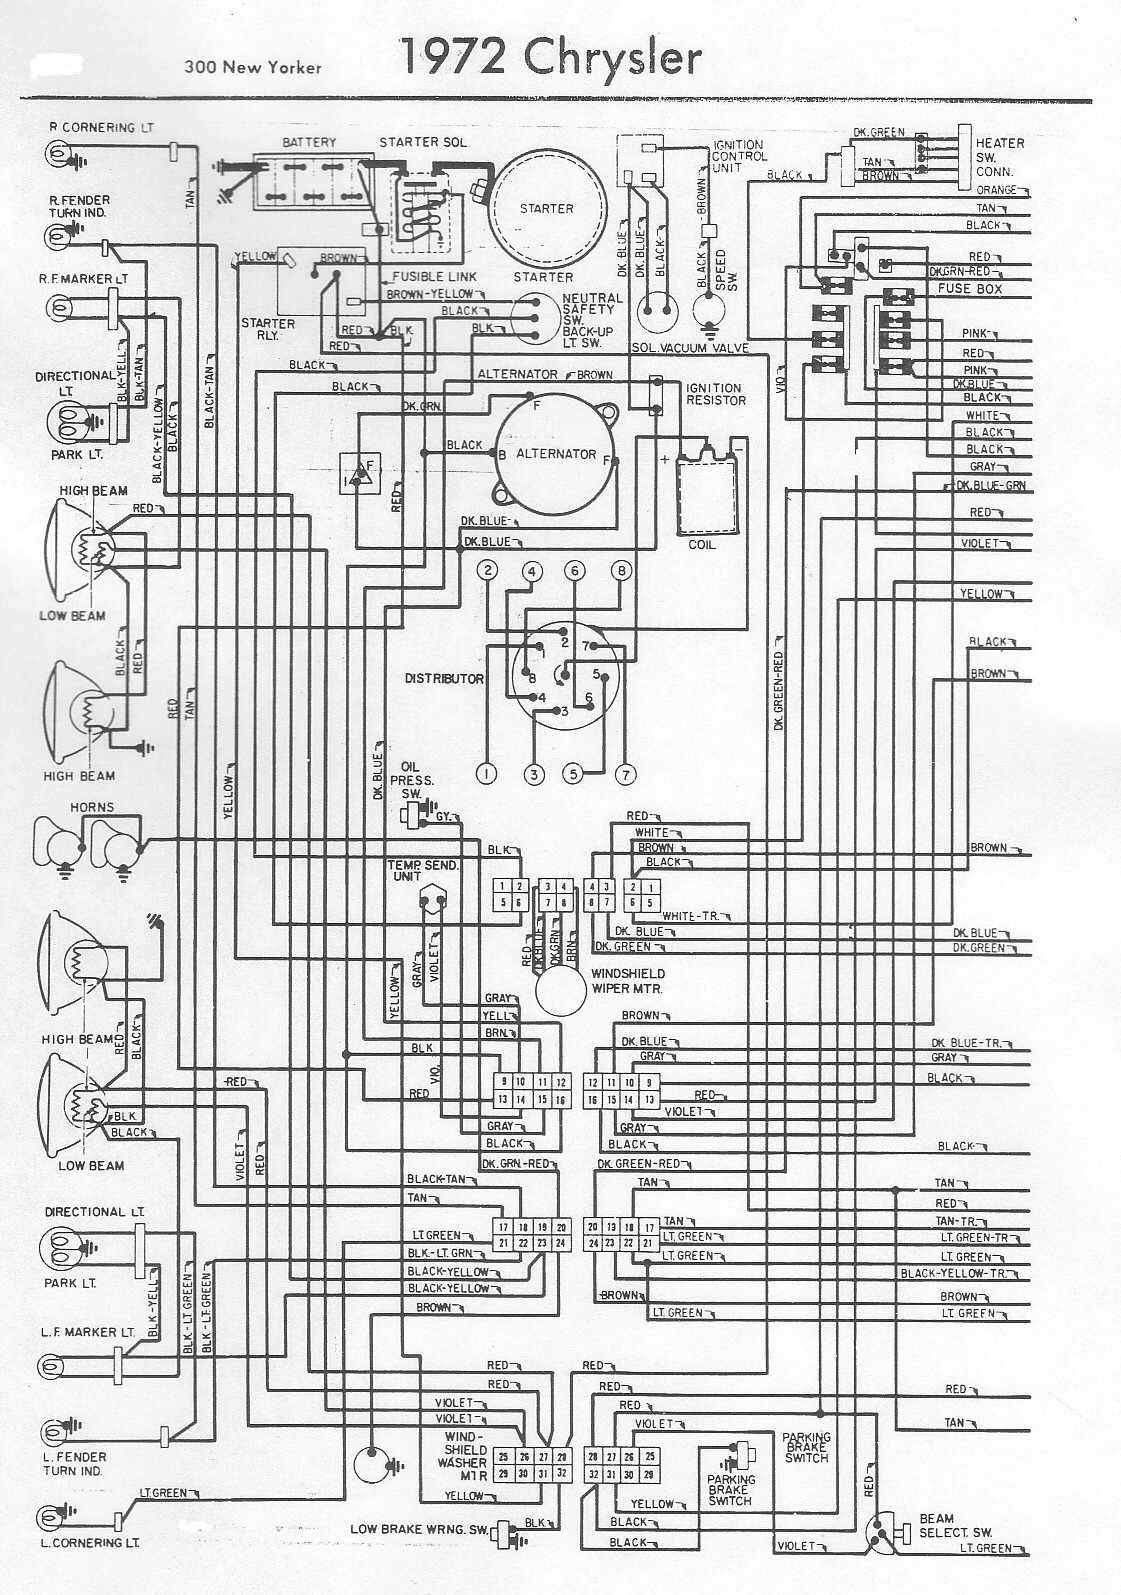 wiring diagrams 1989 chrysler new yorker wiring diagram local  1966 new yorker wiring diagram #3